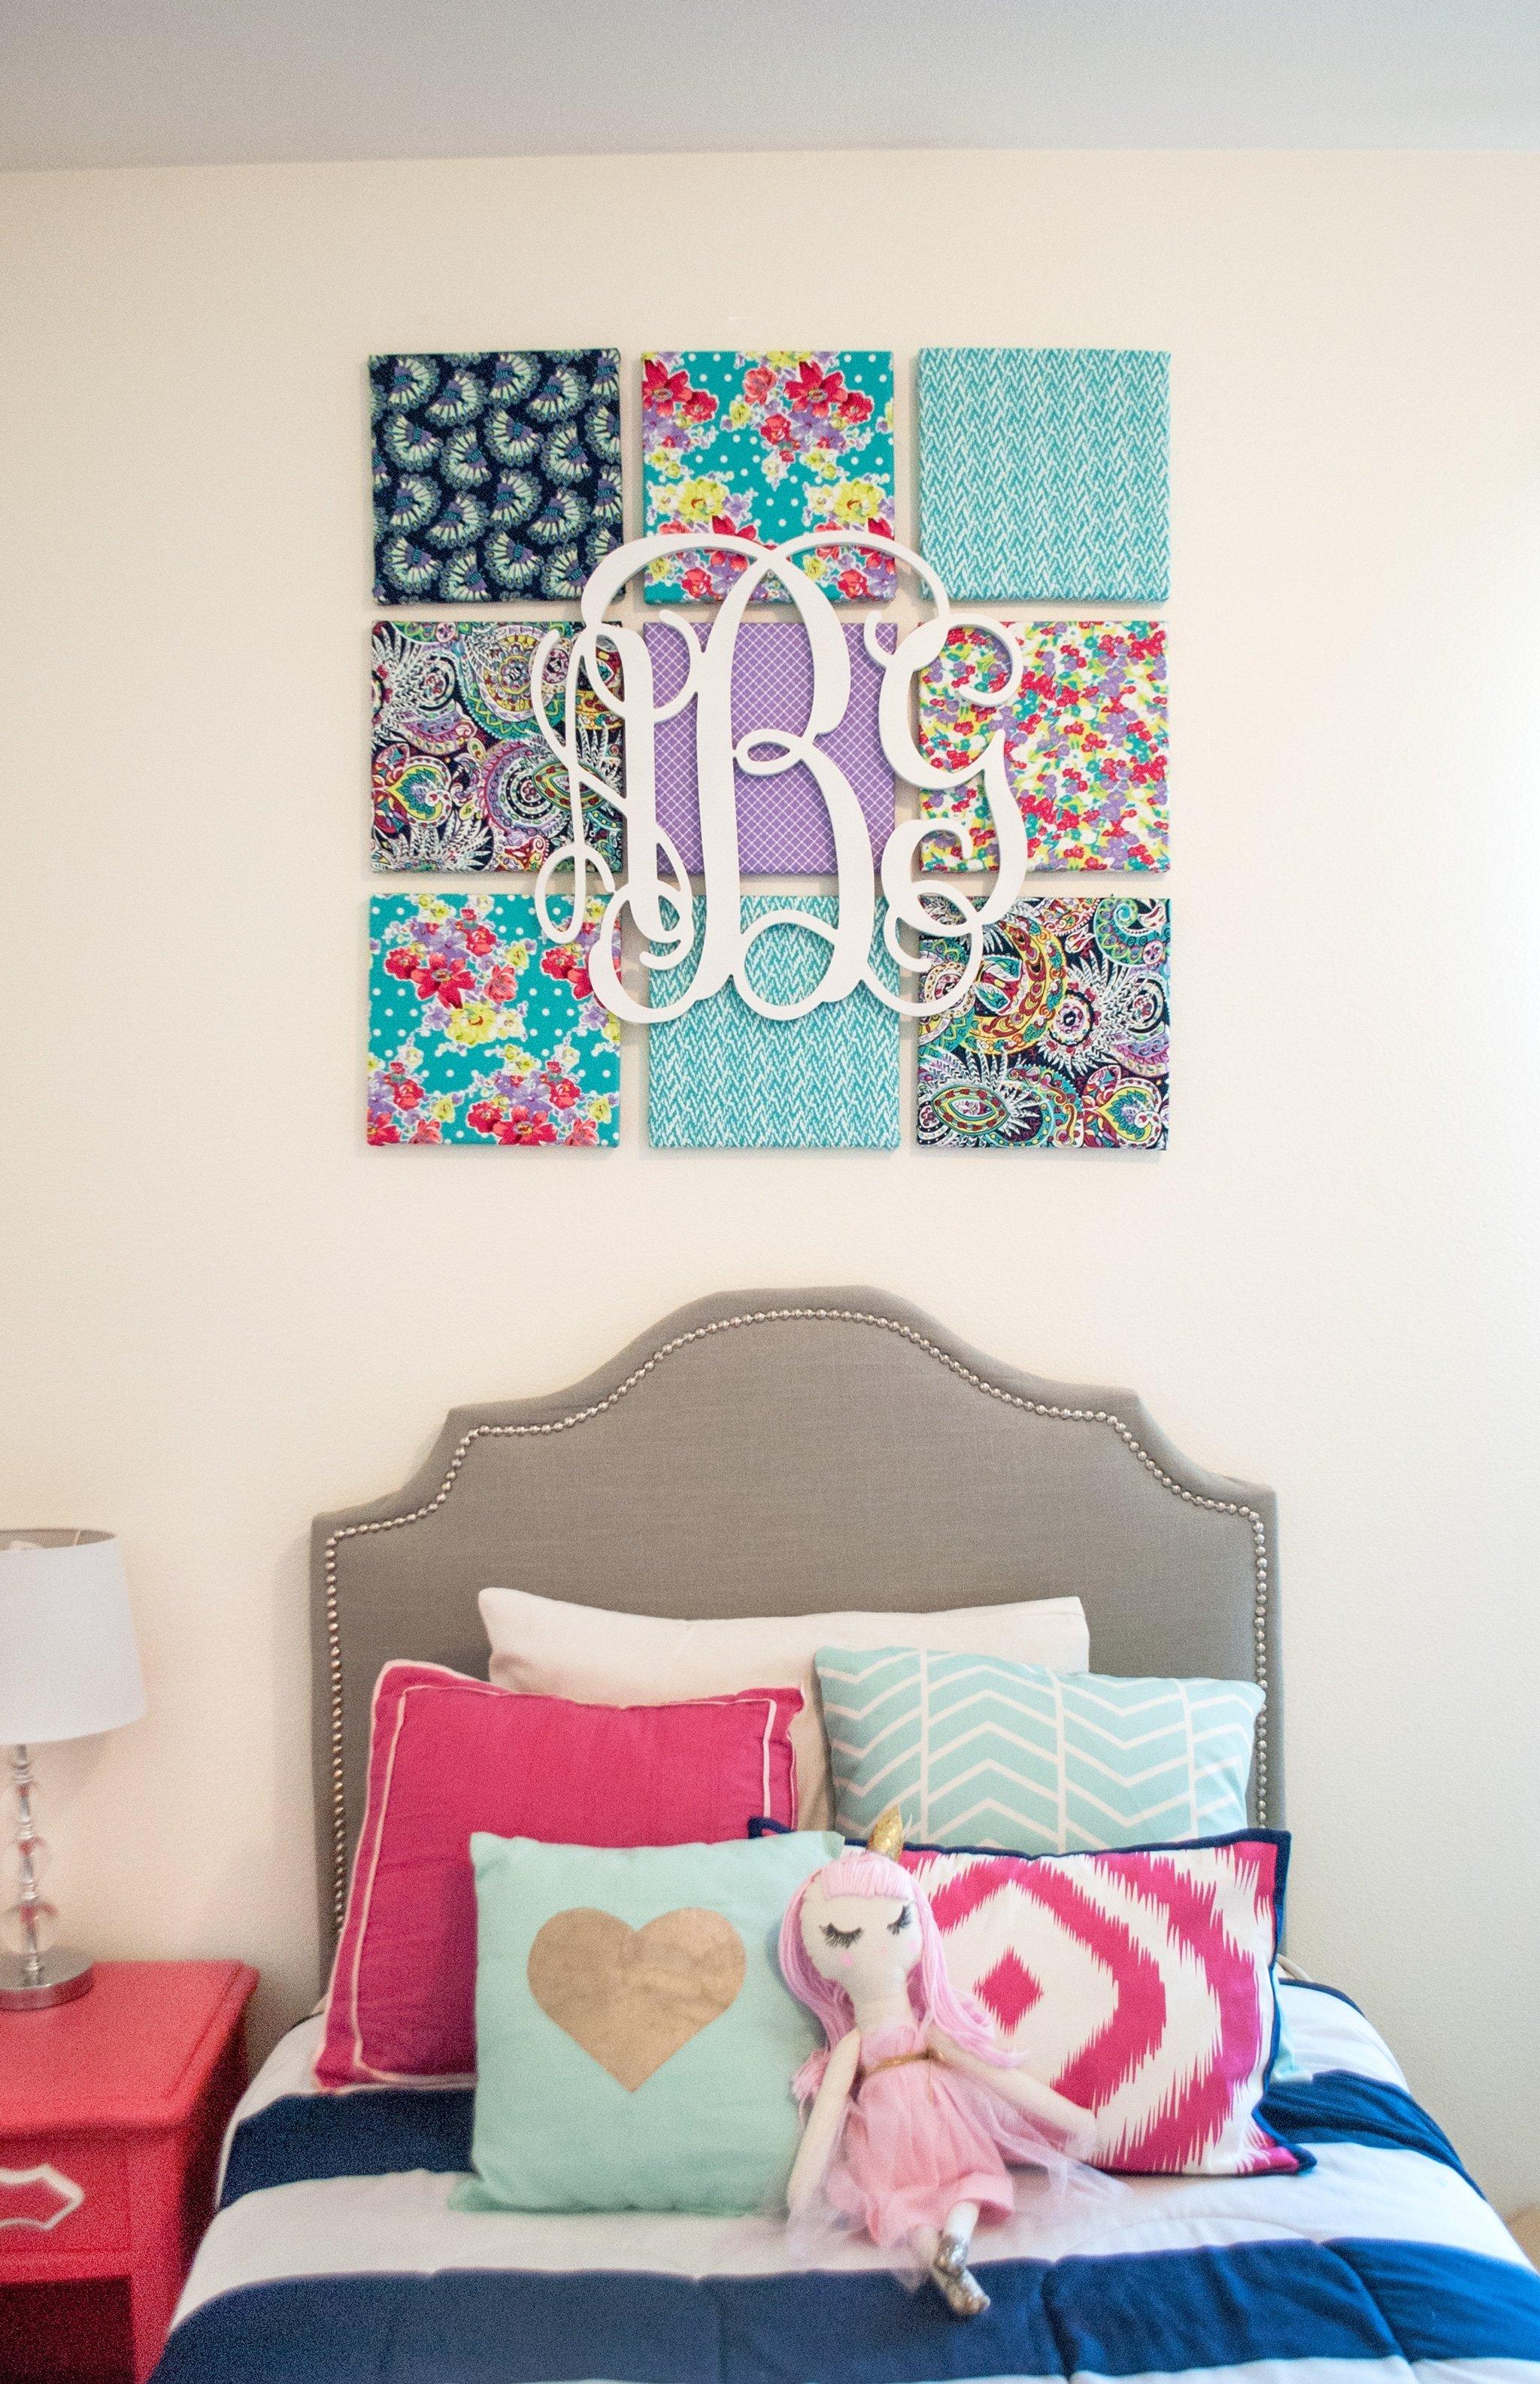 10 Fantastic Diy Canvas Wall Art Ideas wall art decor ideas personalized initial named diy fabric 2020